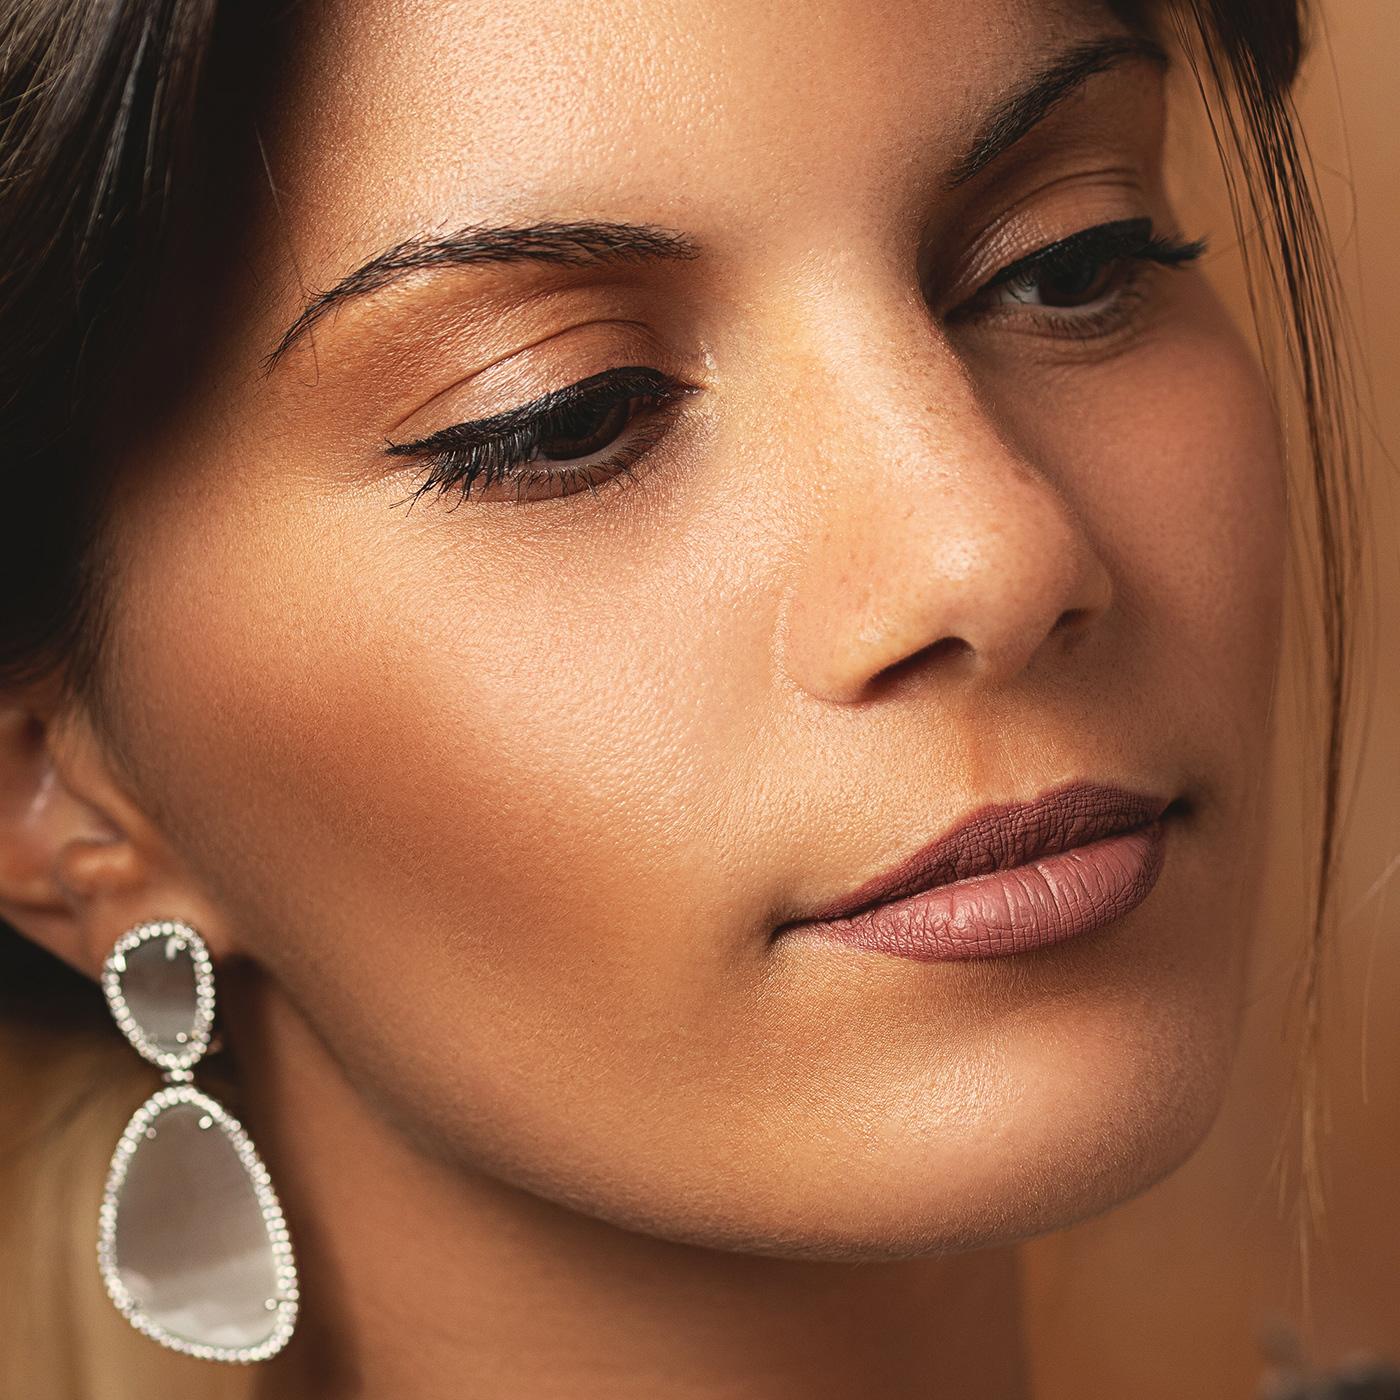 beauty retouch skin Fashion  portrait Photography  studio model Beautiful woman